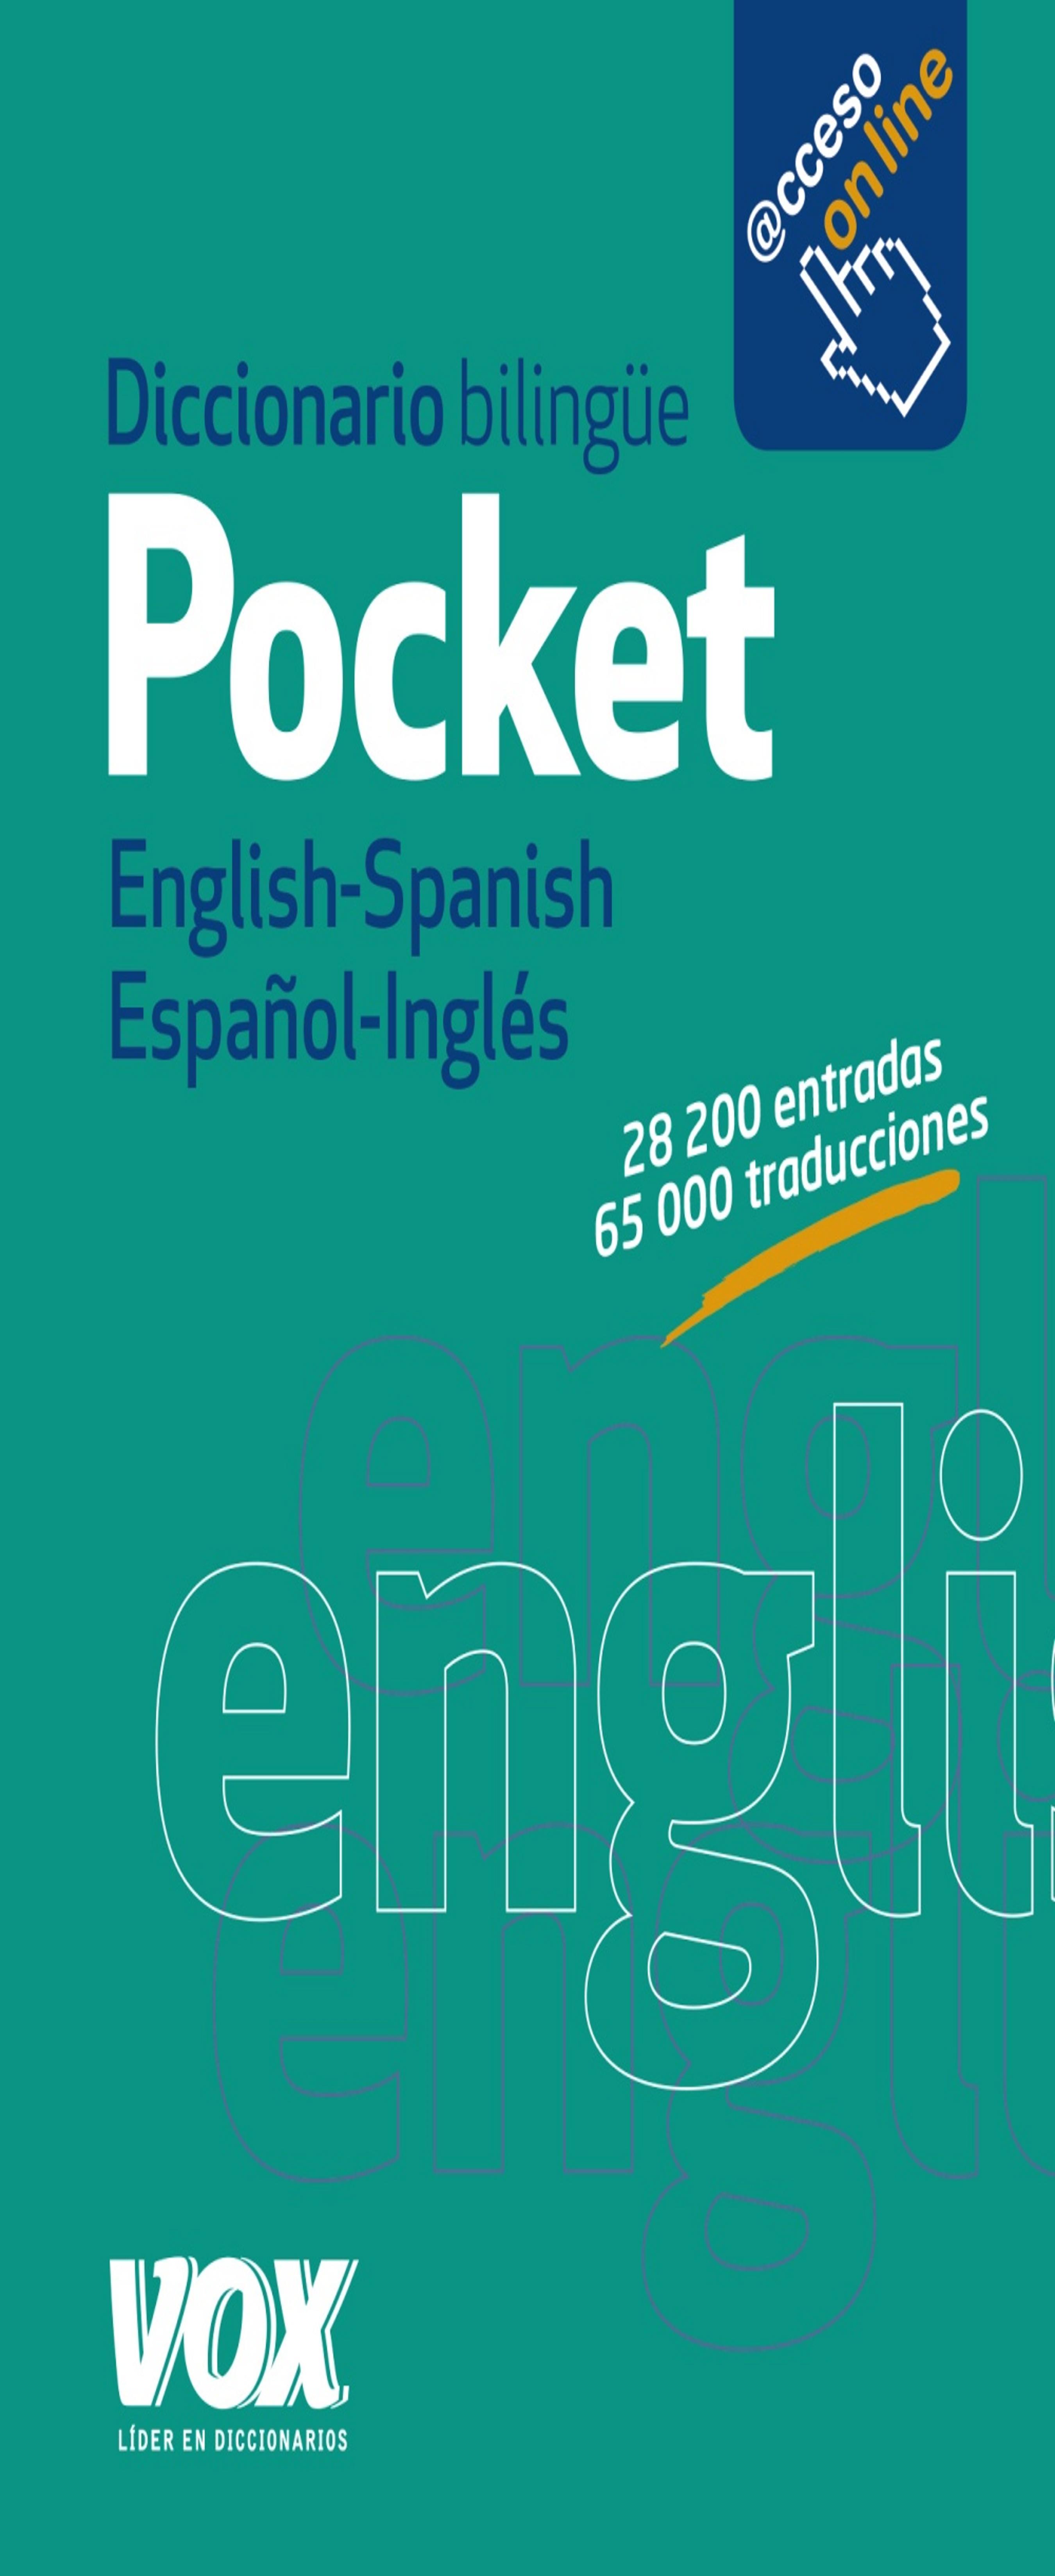 DICC Vox POCKET Inglés - Español / Esp - Ing  Ed. 2016 Acceso Online